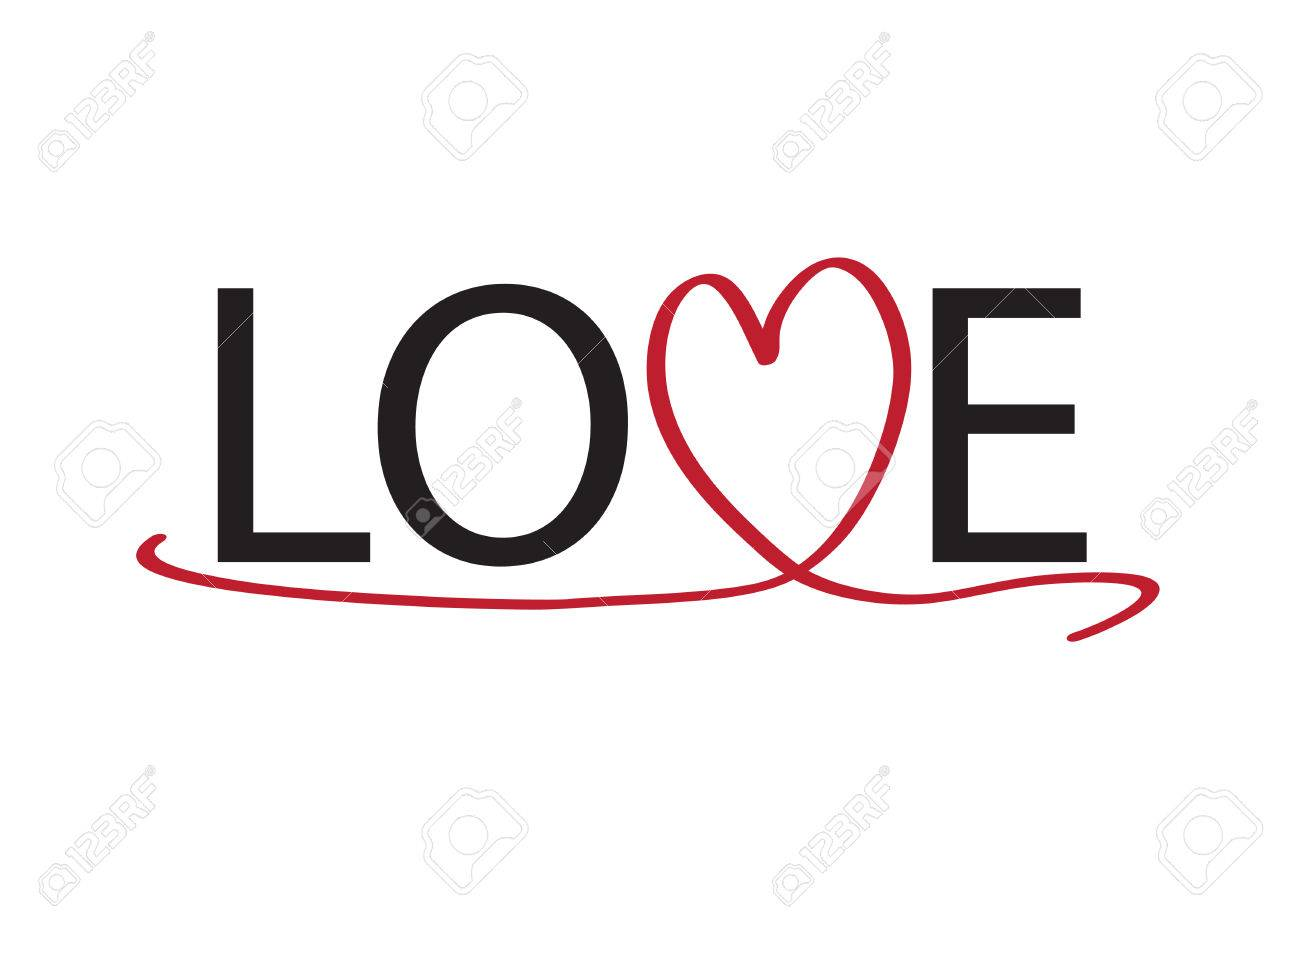 Love Text with Heart Ribbon Stok Fotoğraf - 65494736